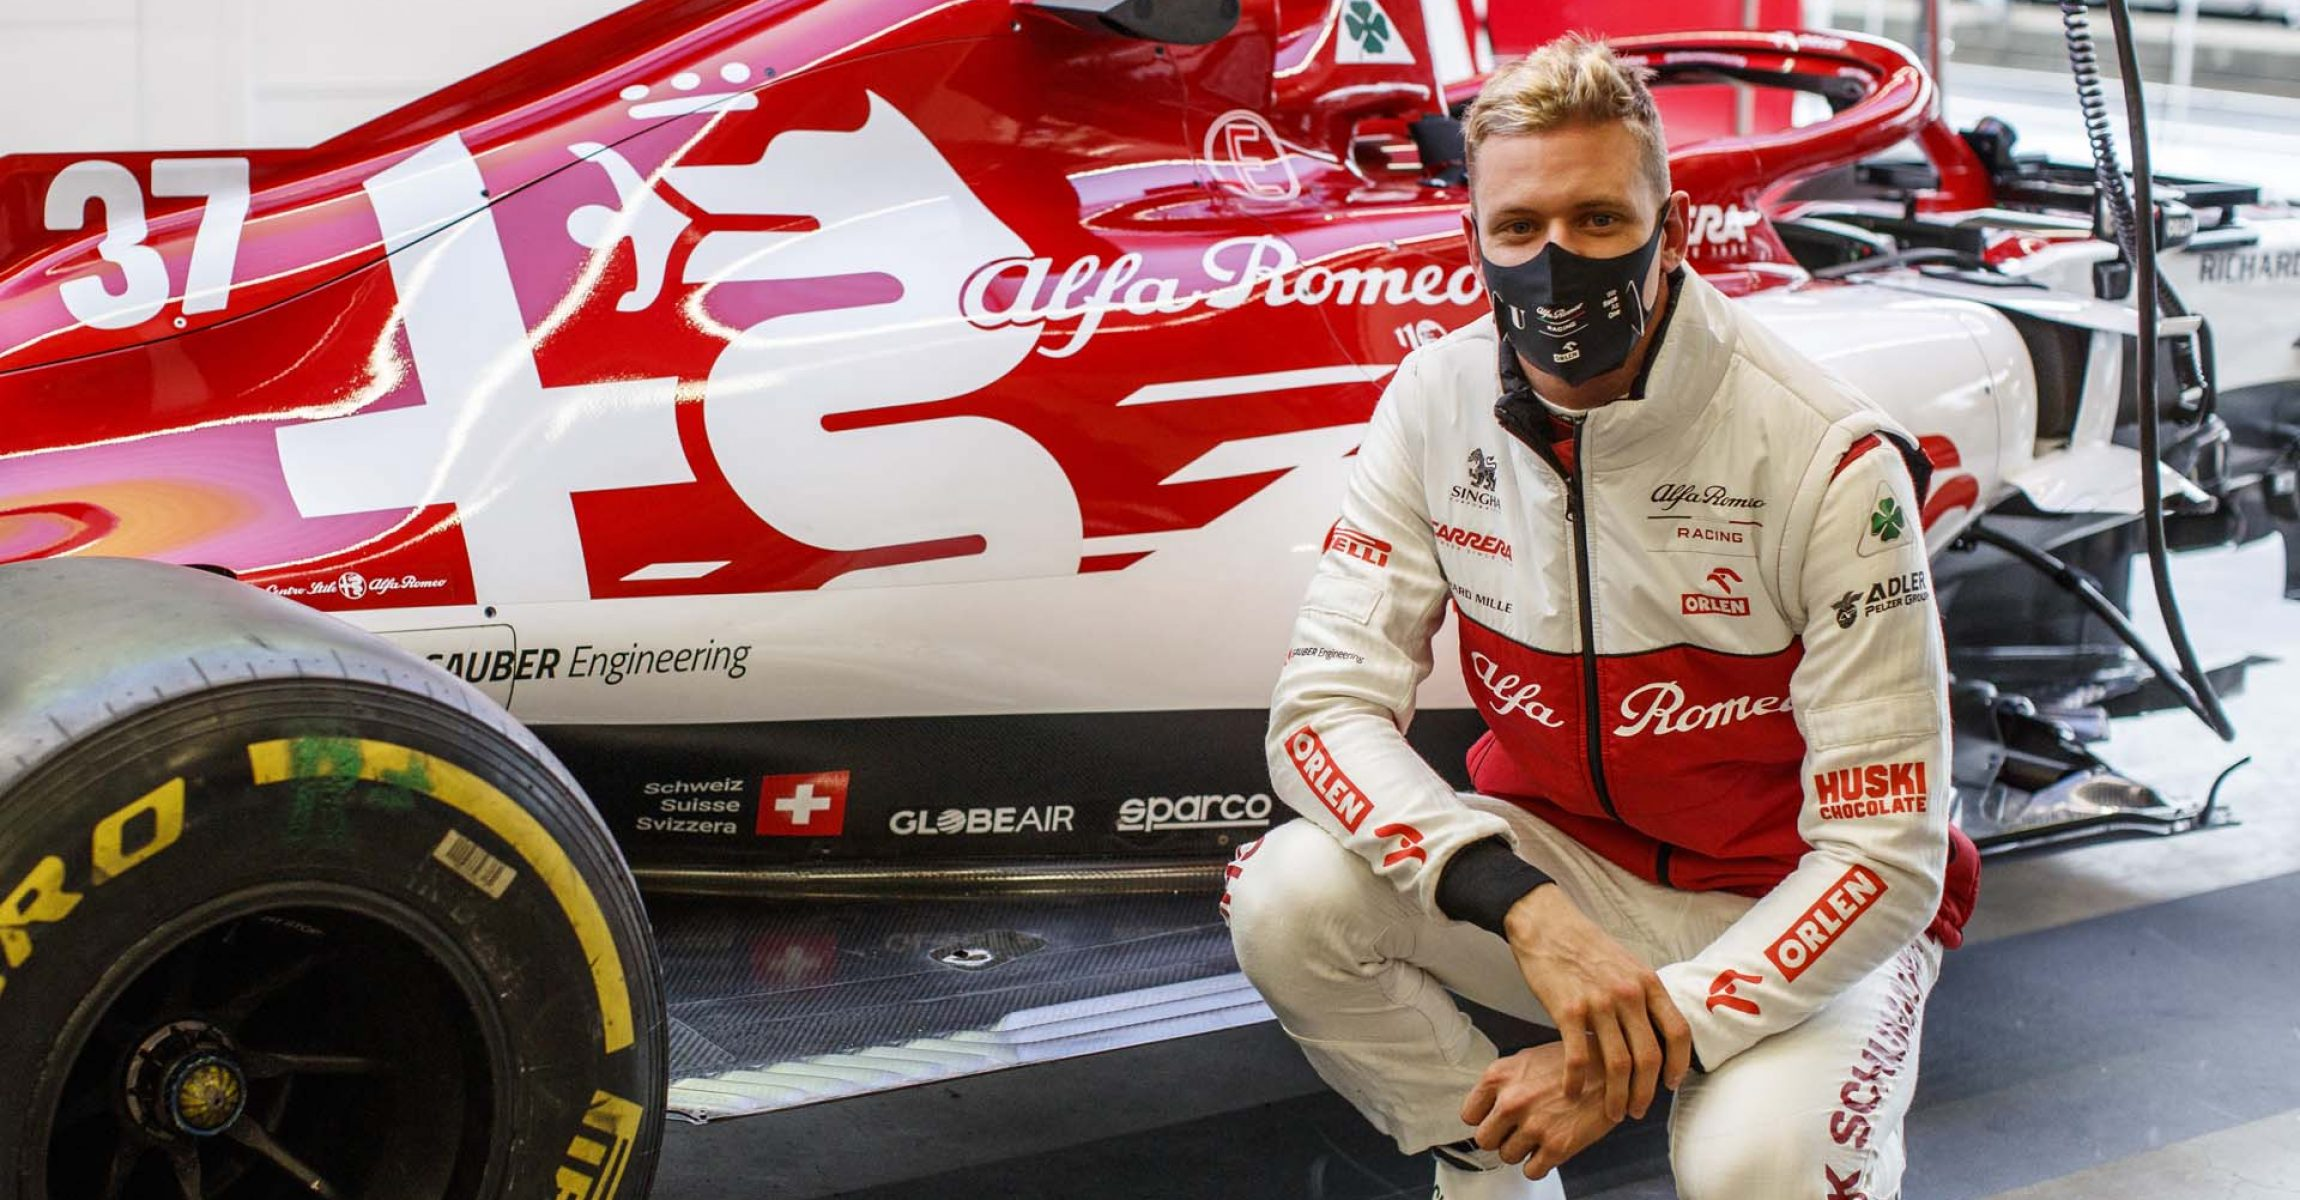 SCHUMACHER Mick (ger), Alfa Romeo Racing ORLEN C39, portrait during the Formula 1 Aramco Grosser Preis Der Eifel 2020, Eifel Grand Prix, from October 9 to 11, 2020 on the Nürburgring, in Nürburg, Germany - Photo Xavi Bonilla / DPPI